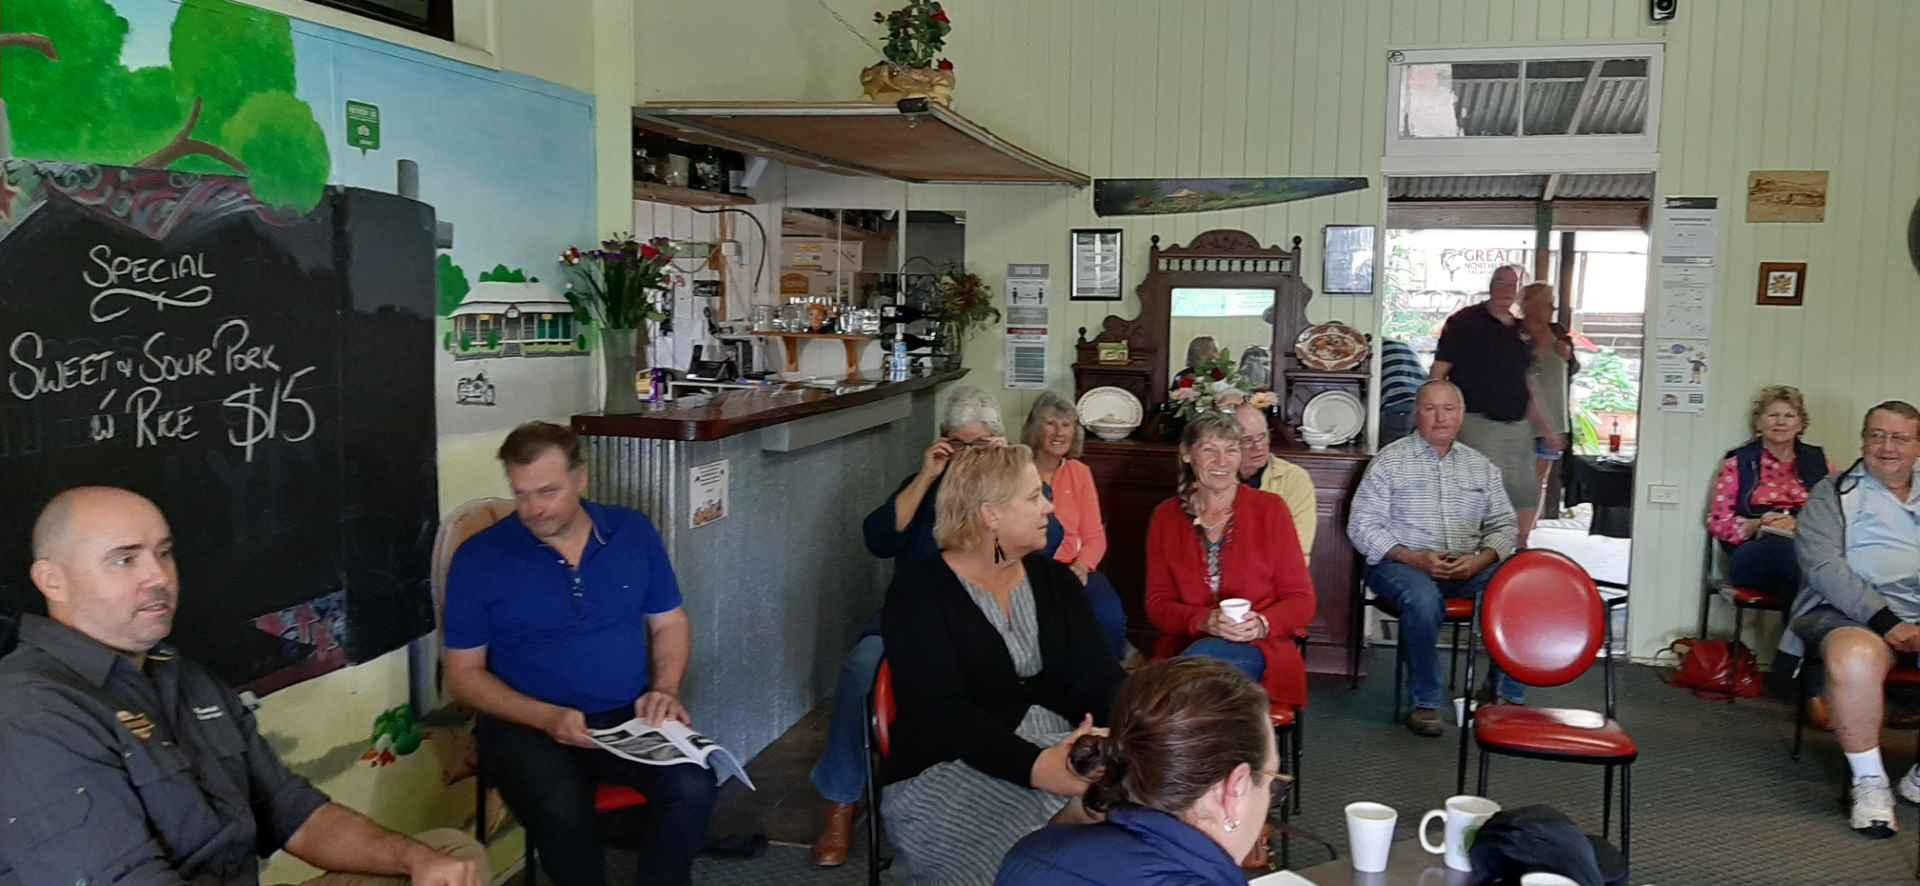 Members of Boyne Burnett Inland Rail Trail sitting, meeting Mungungo Pub